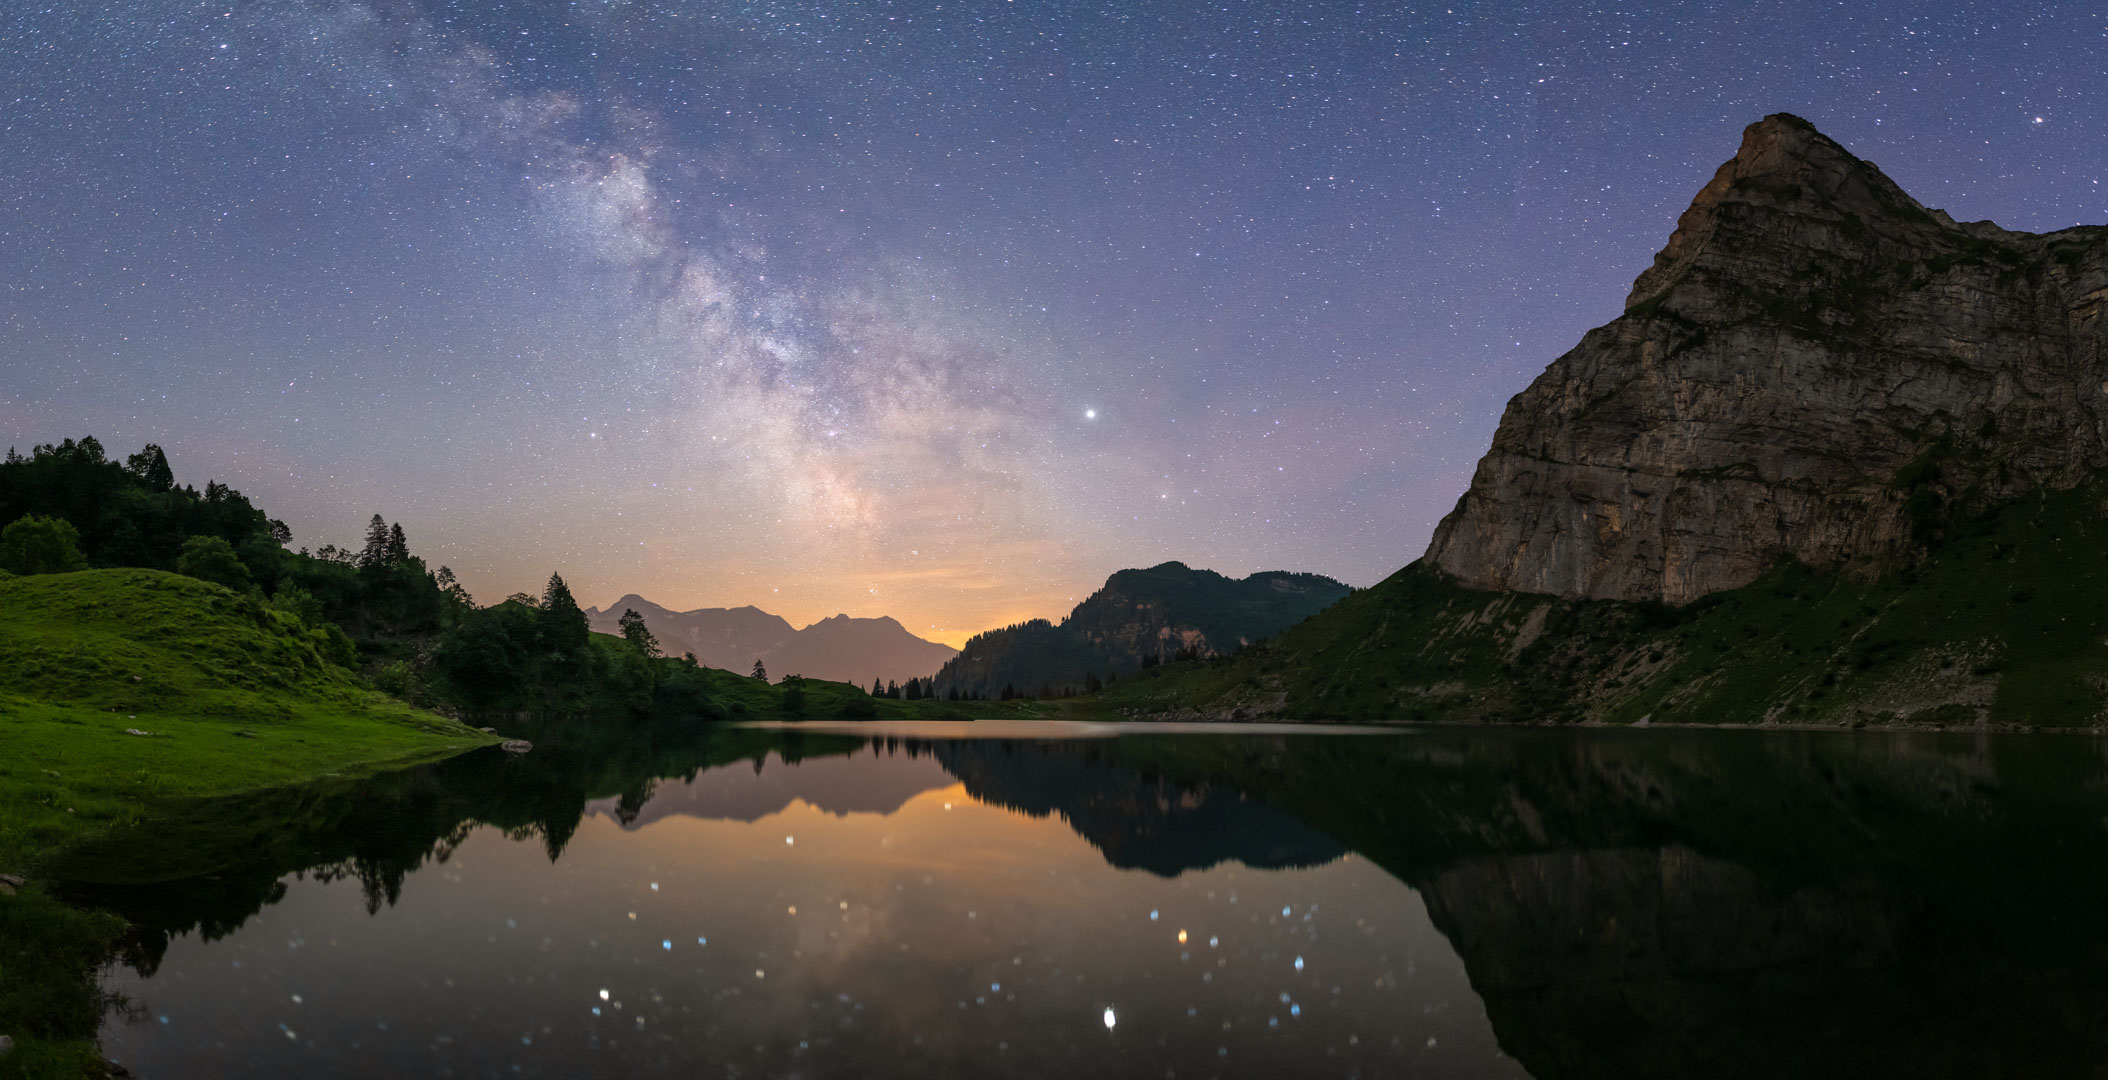 Milky Way Panorama Reflecting in Alpine Lake